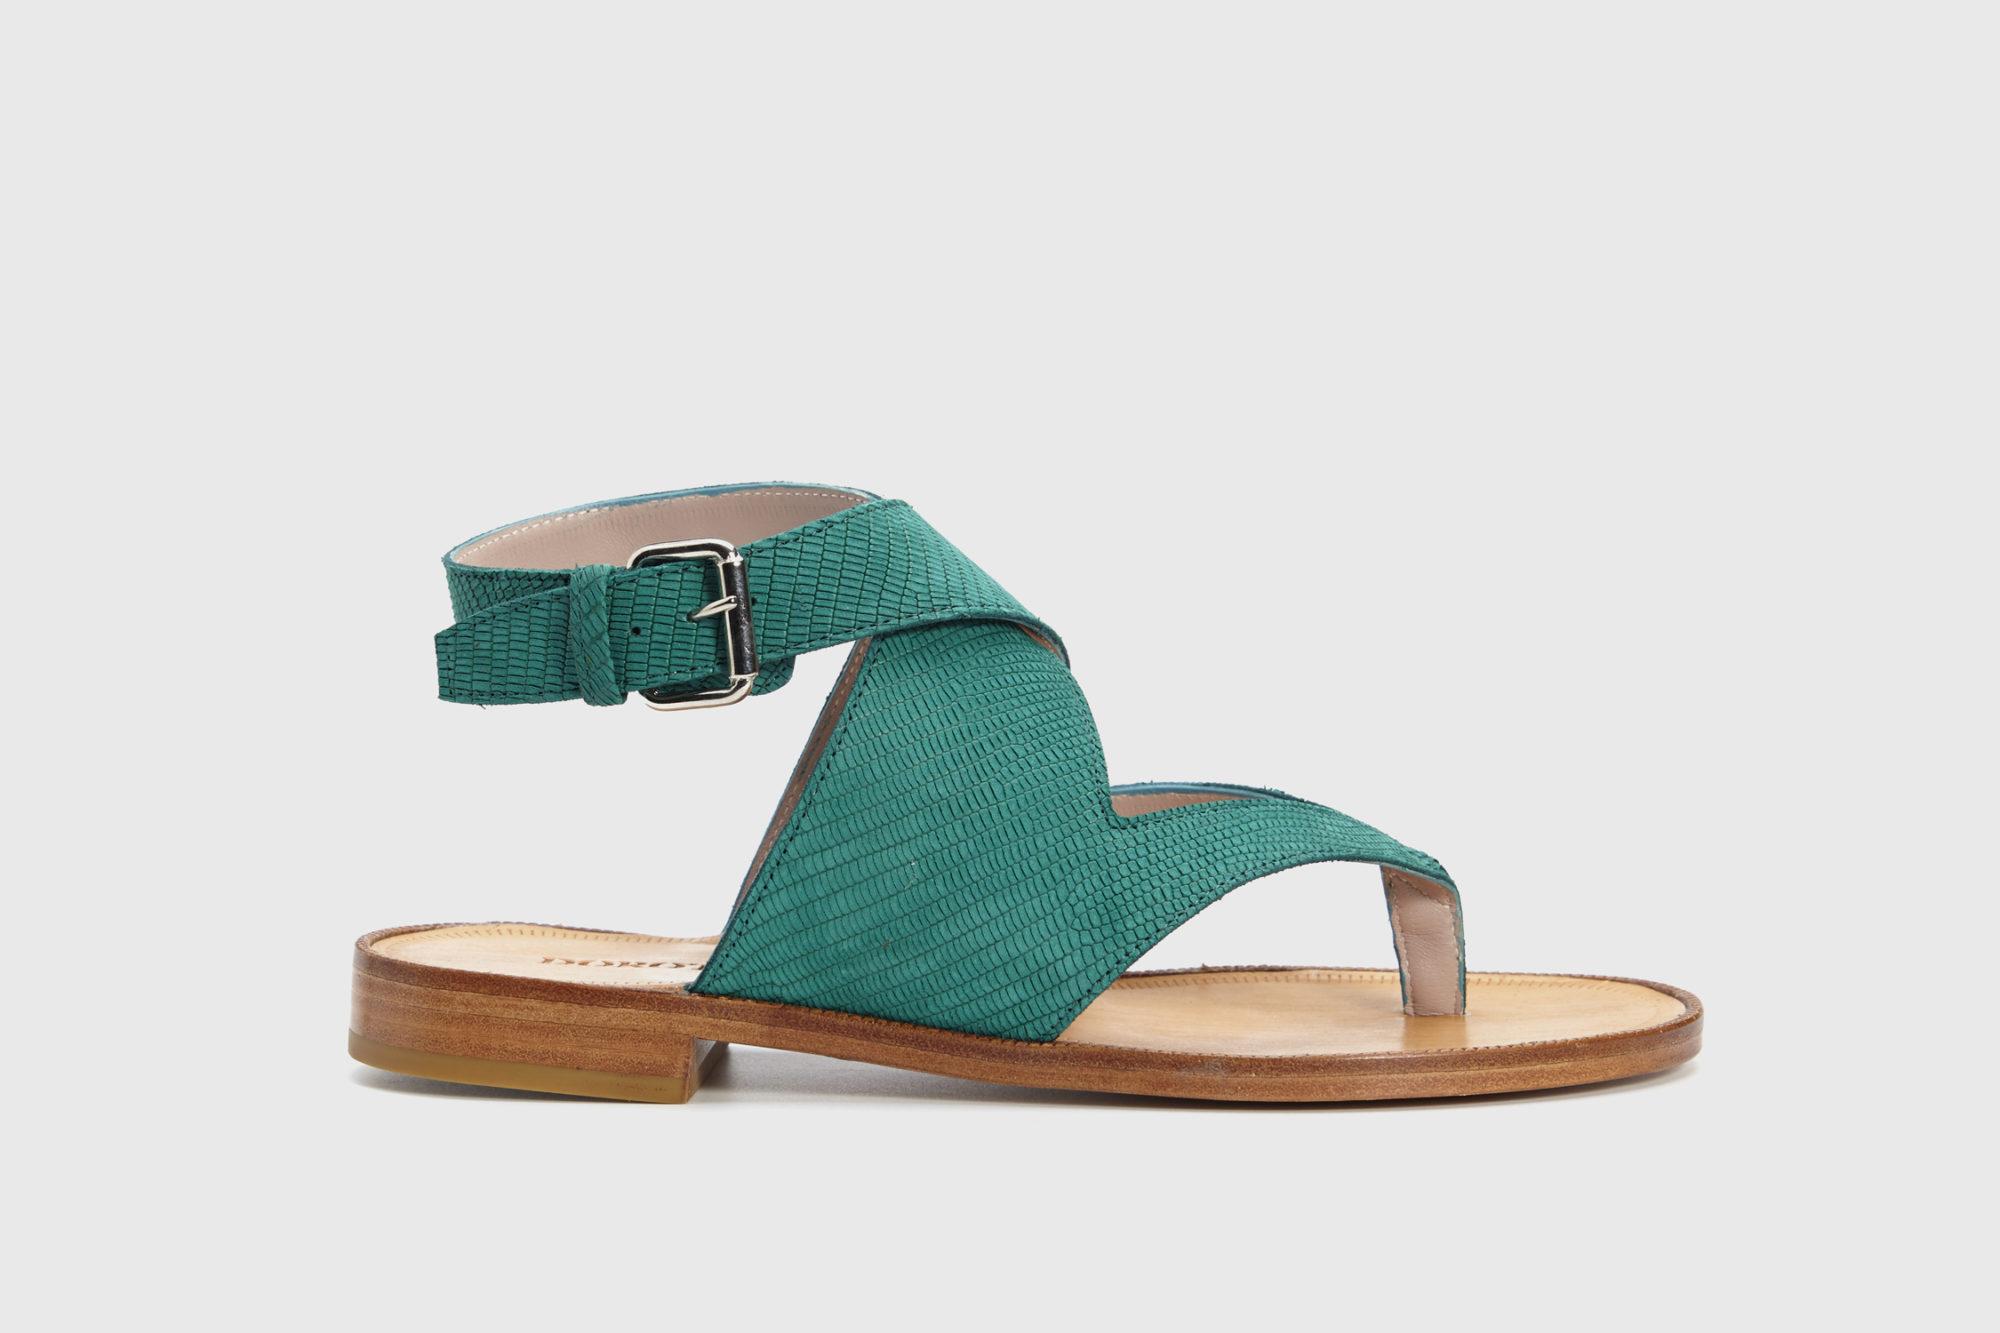 Dorotea sandalia plana Martina verde ss18 perfil